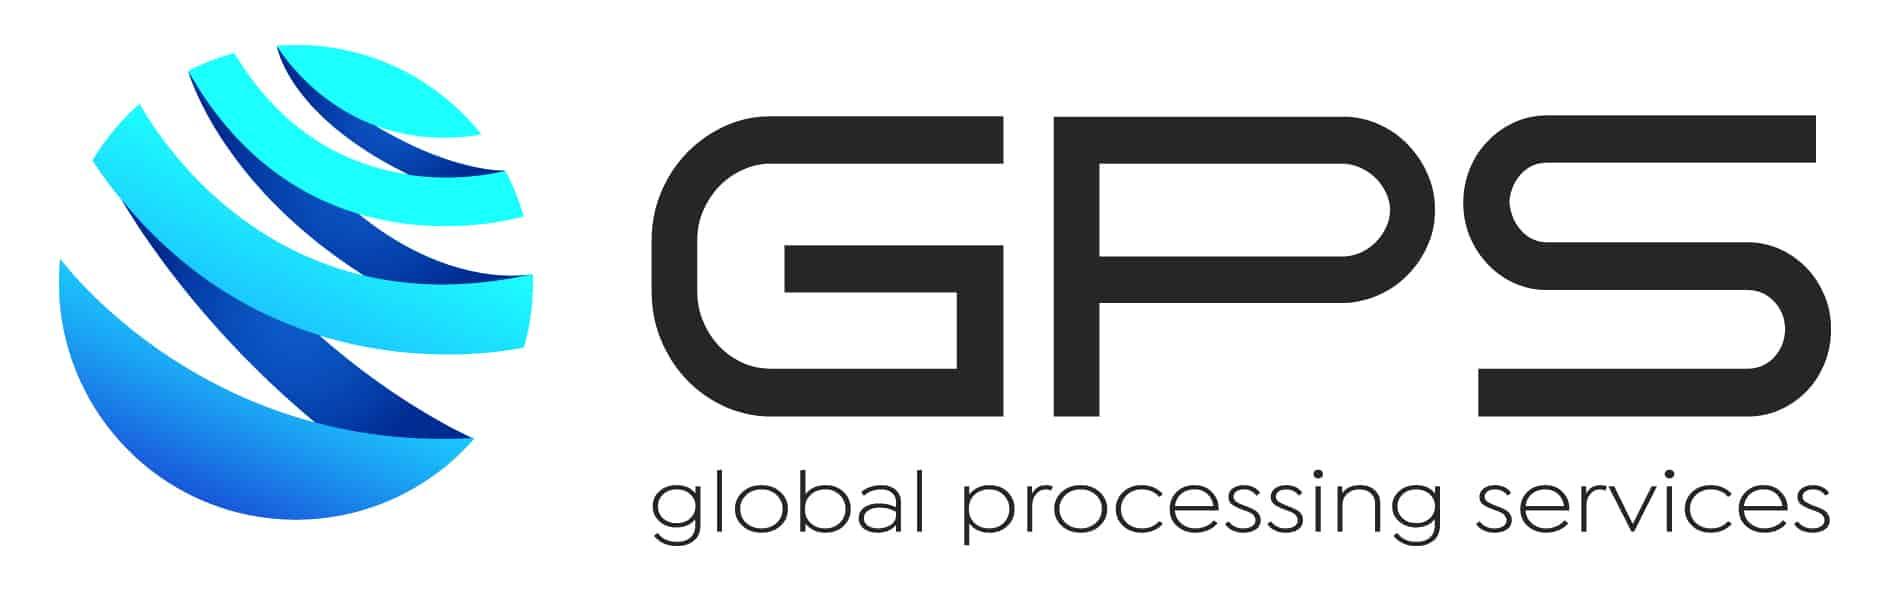 GPS_LOGO_2020